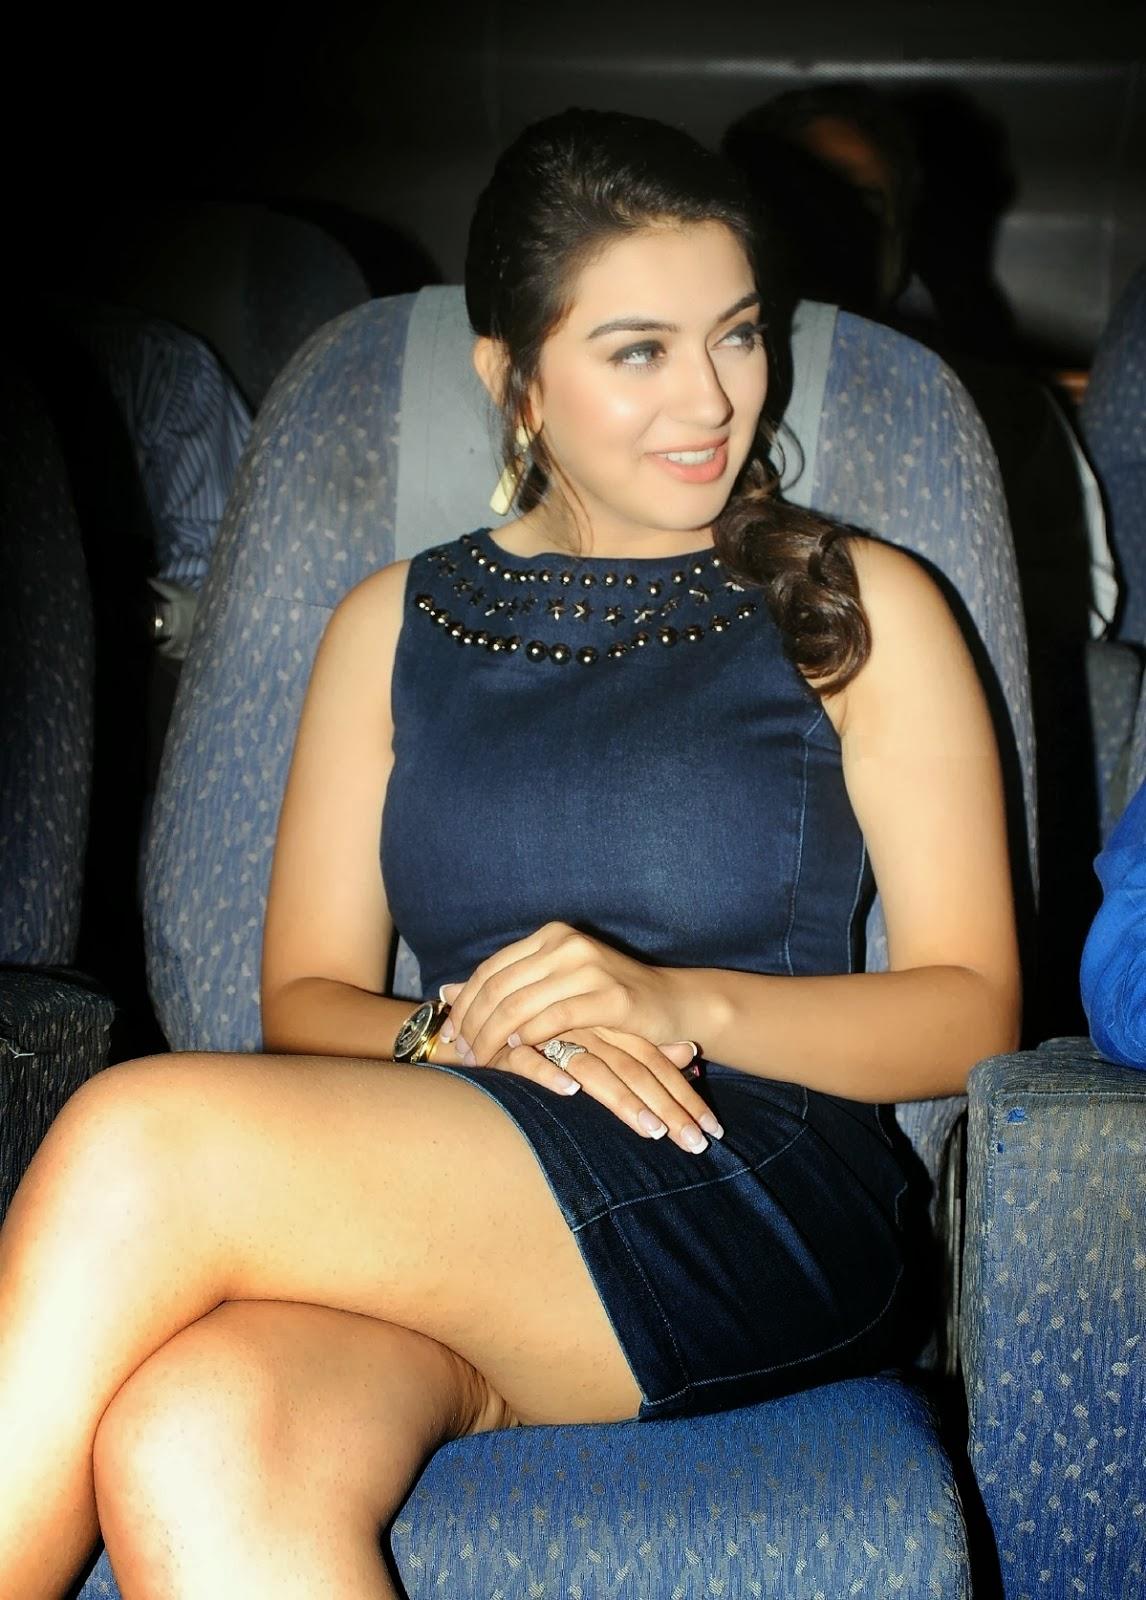 Hansika Motwani Showcasing Her Big Boobs And Milky Legs In -6061